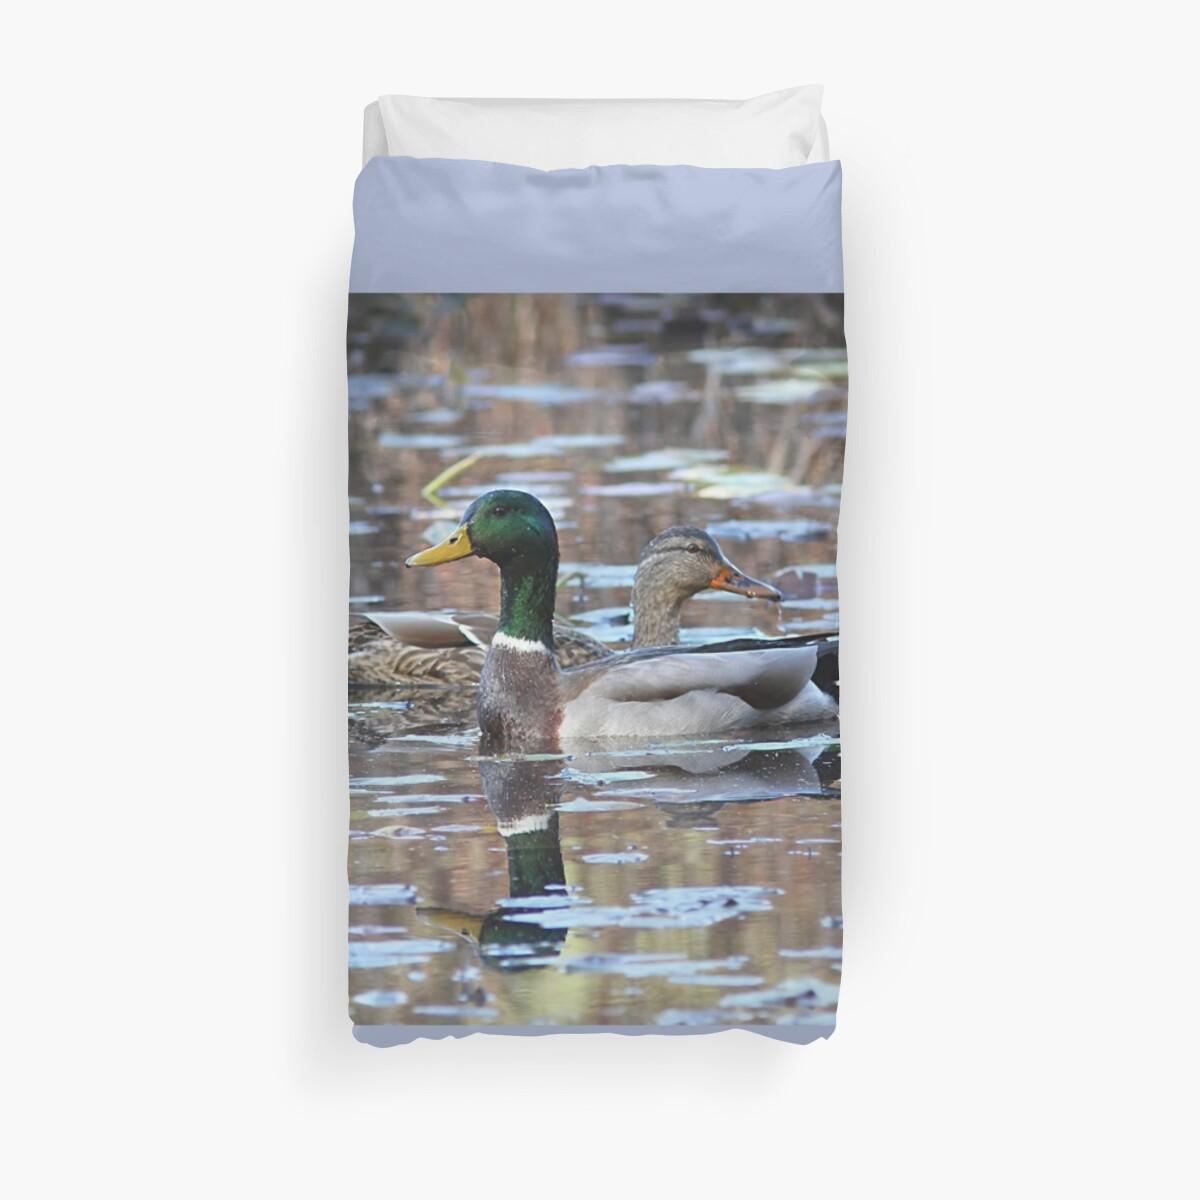 Mallard Duck pair in autumn by Linda Crockett